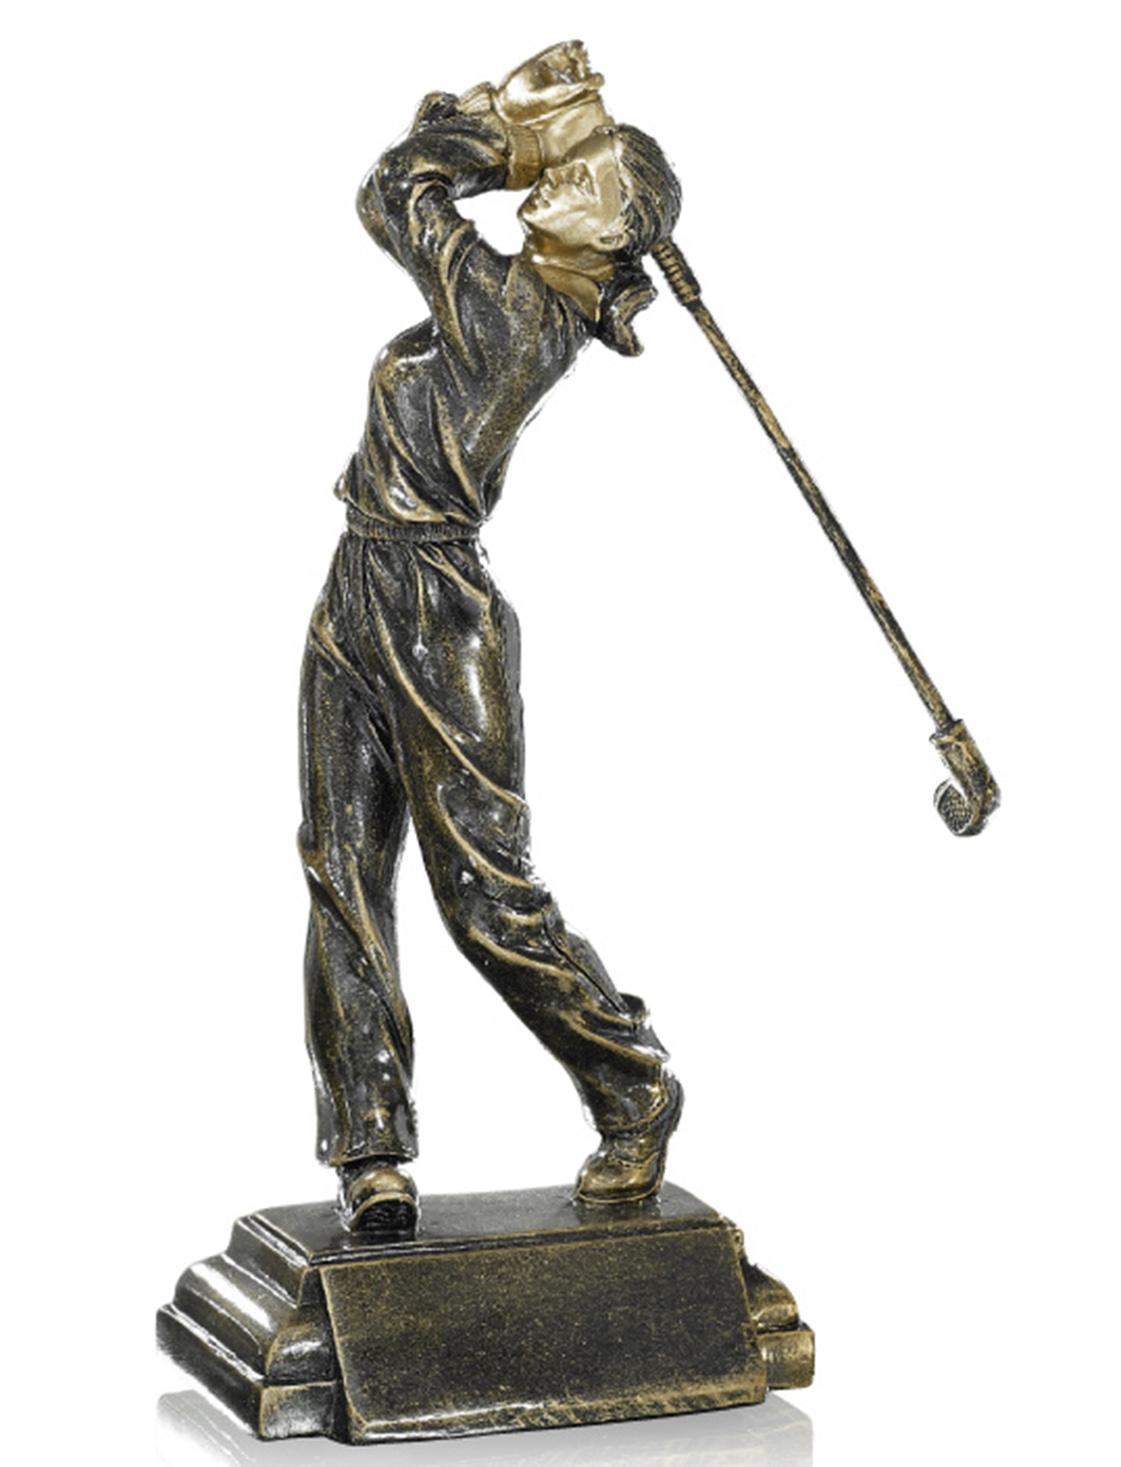 Golf-Figur: 9-102-52564 in 25 cm